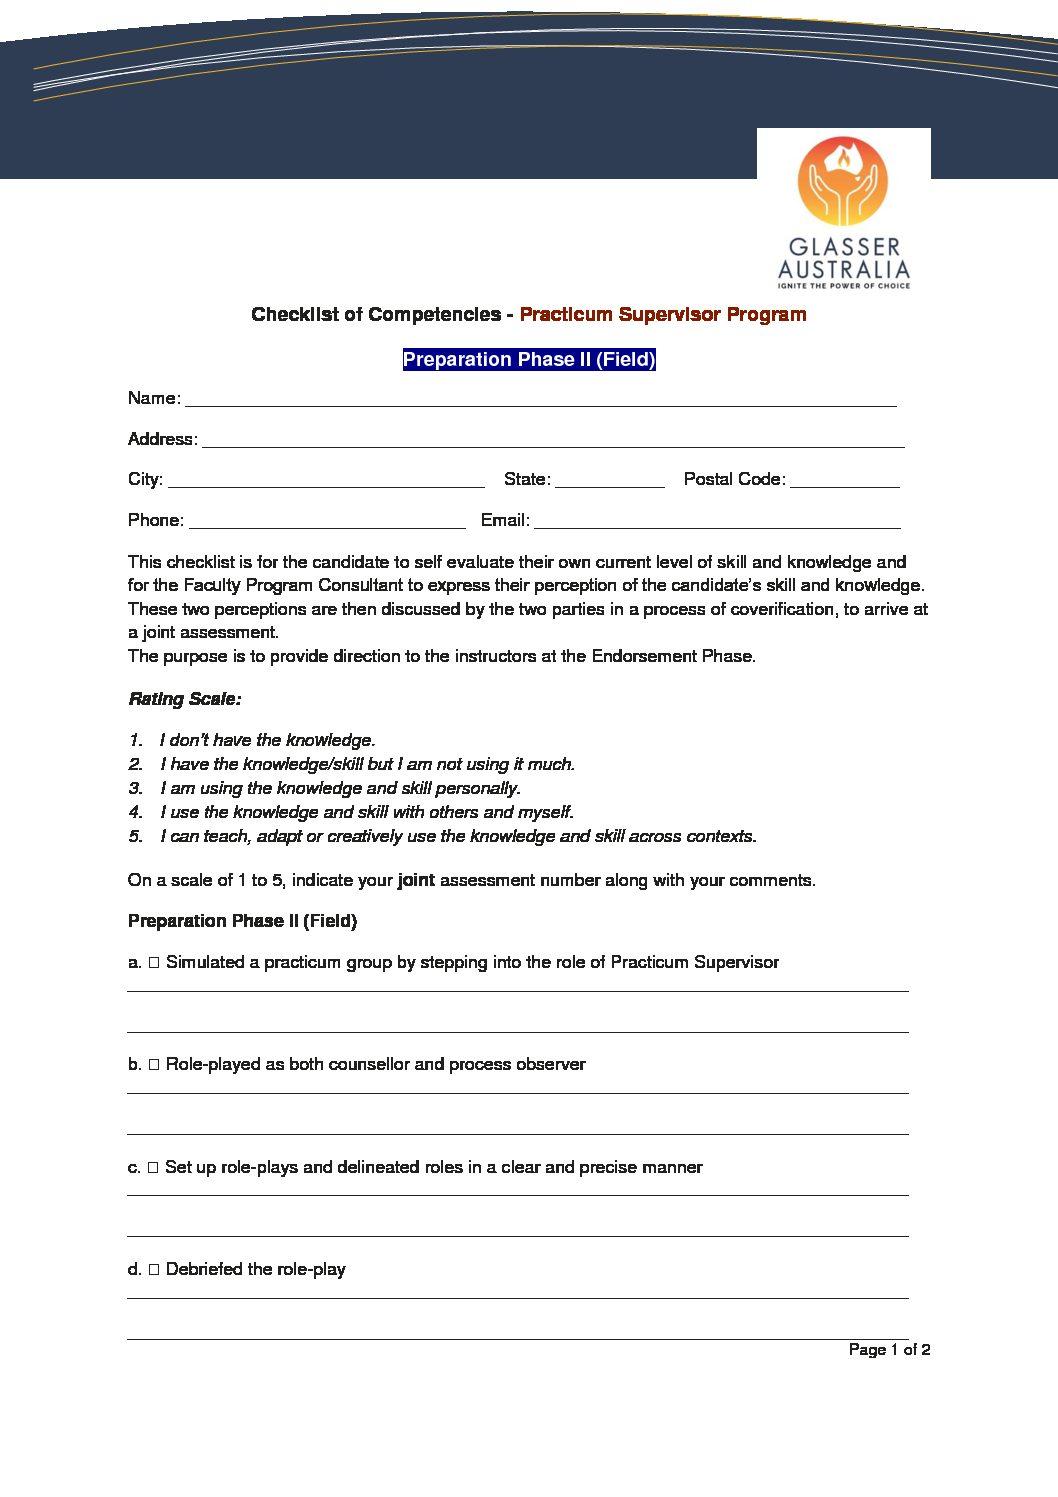 Checklist of Compet Practicum Supervisor Program Phase II (Field)